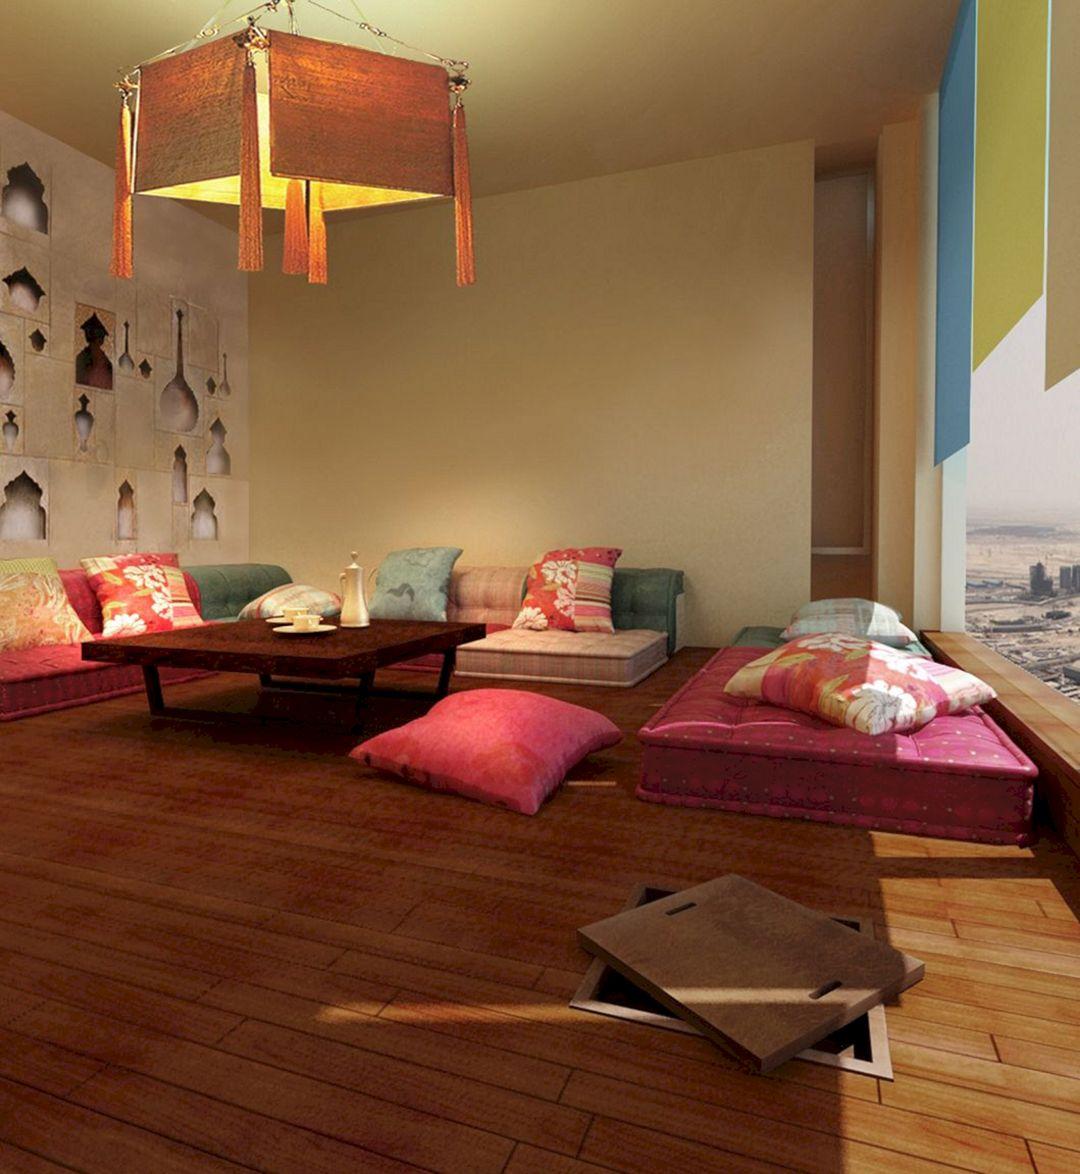 arabian style living room - HD1059×1151